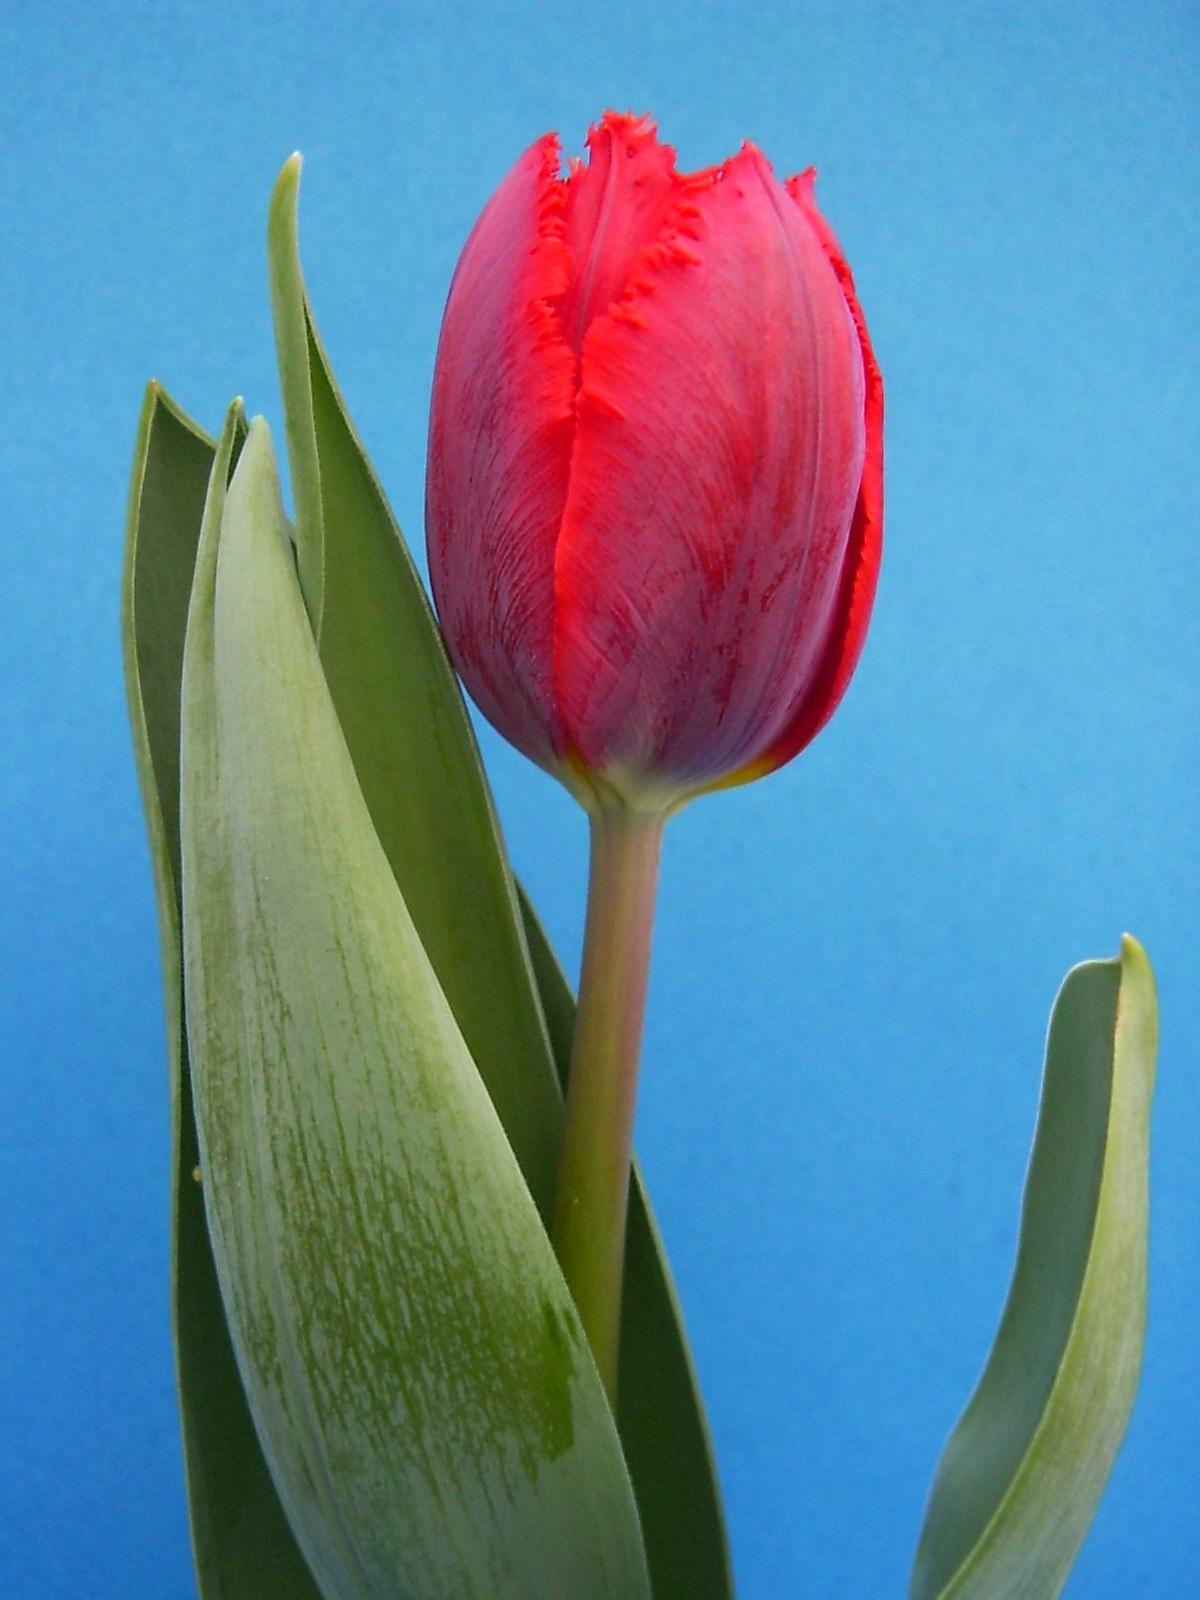 Plik:Tulipan (Ama).JPG – Wikipedia, wolna encyklopedia